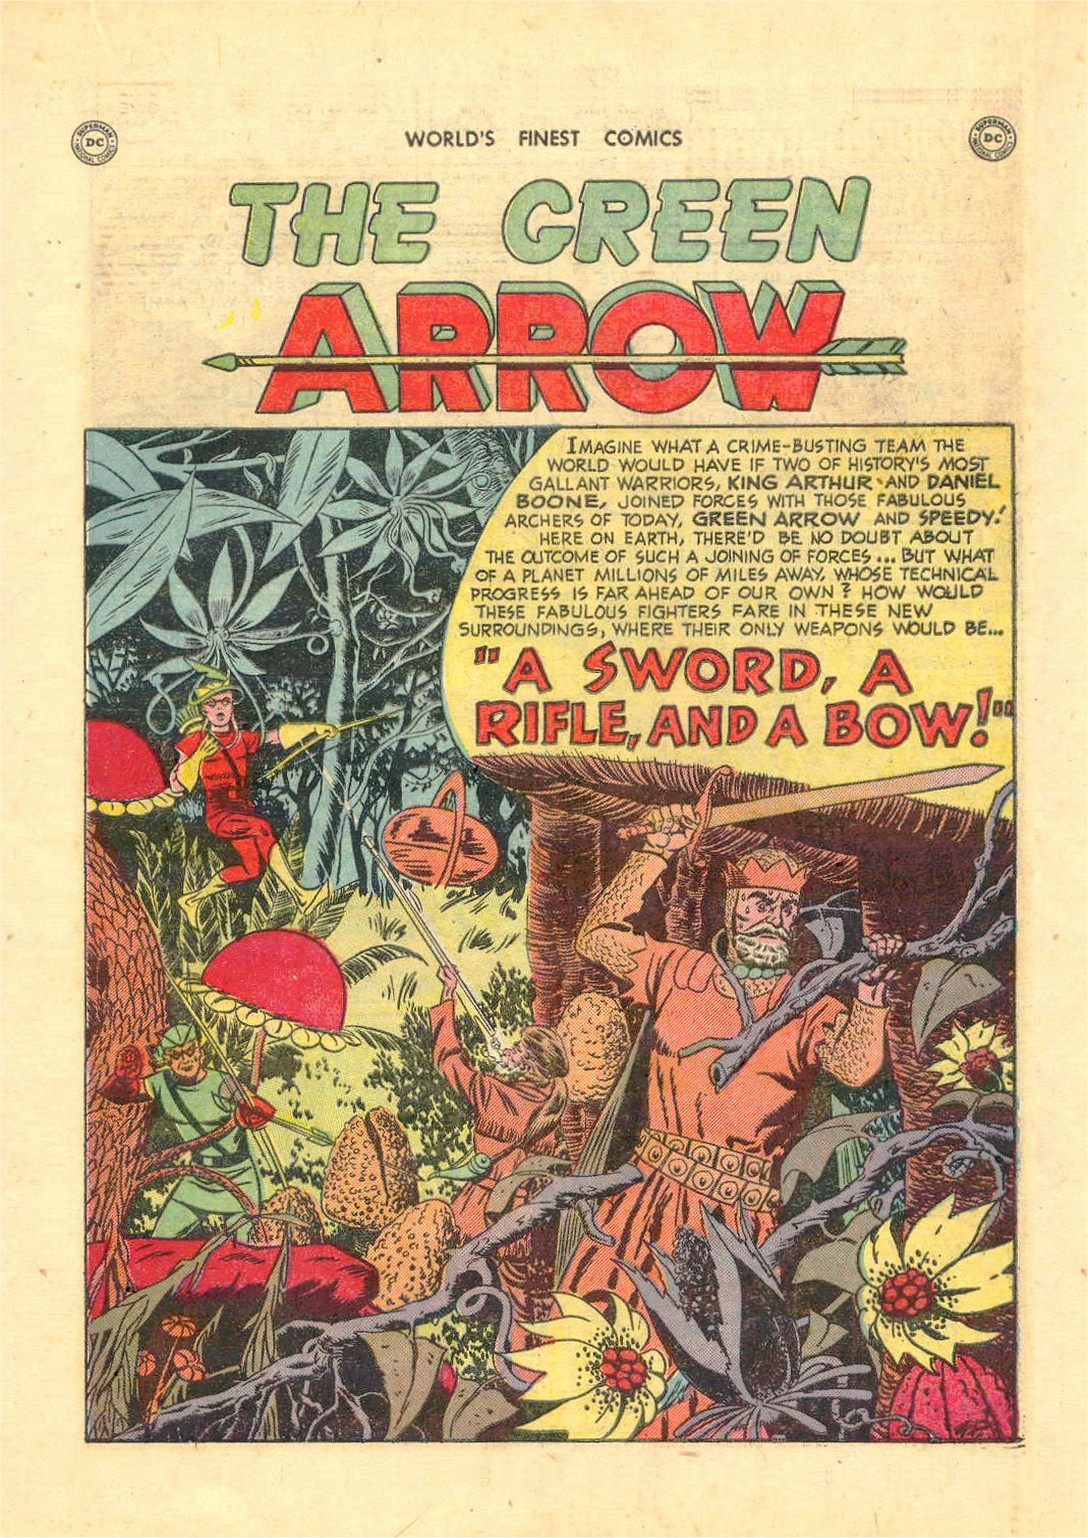 Read online World's Finest Comics comic -  Issue #52 - 41